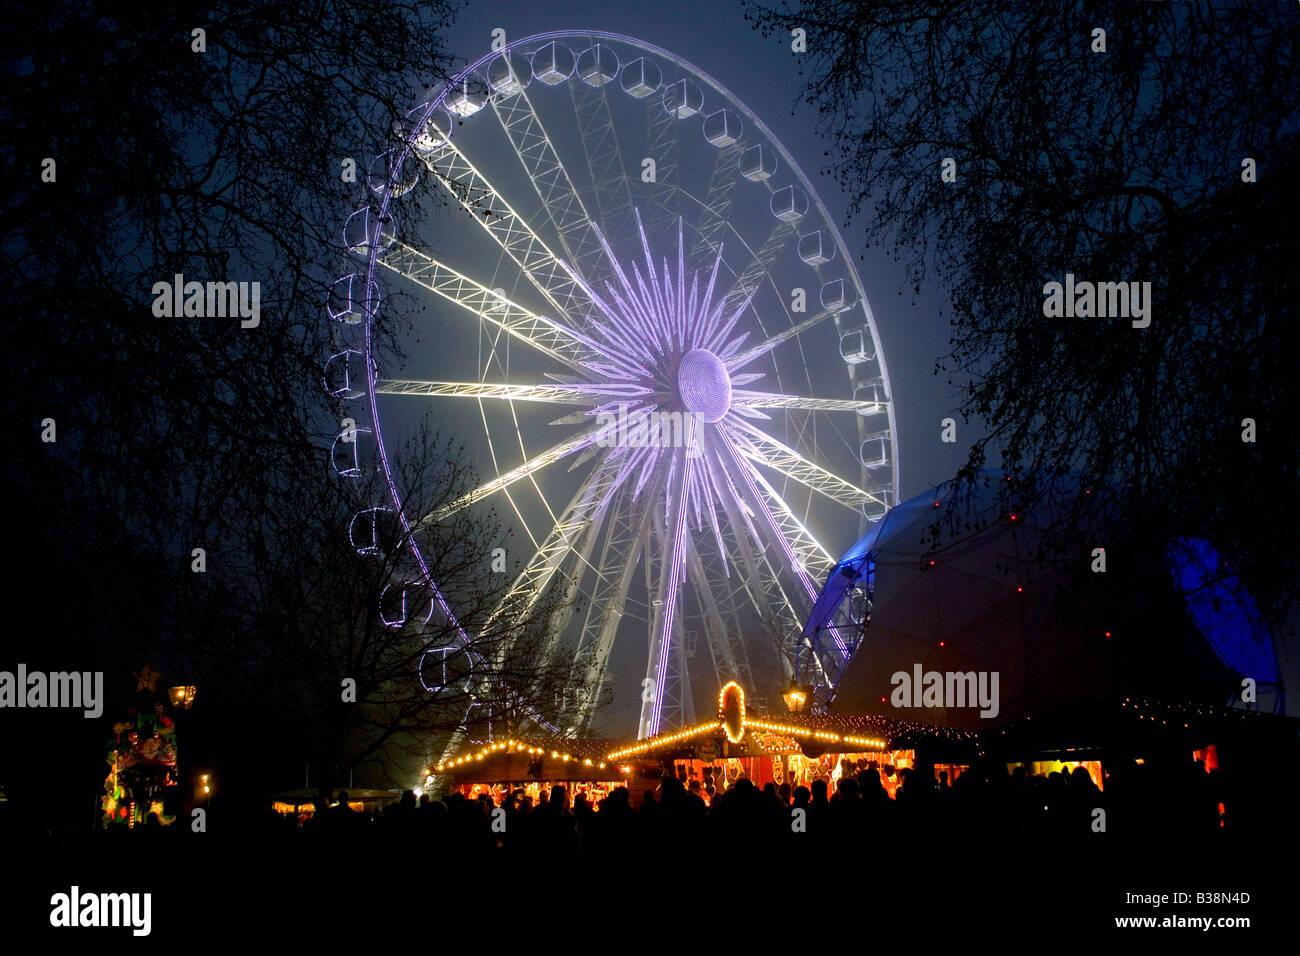 HYDE PARK LONDON CHRISTMAS TIME WINTER WONDERLAND CHRISTMAS MARKETS AND FUN FAIR RIDES - Stock Image